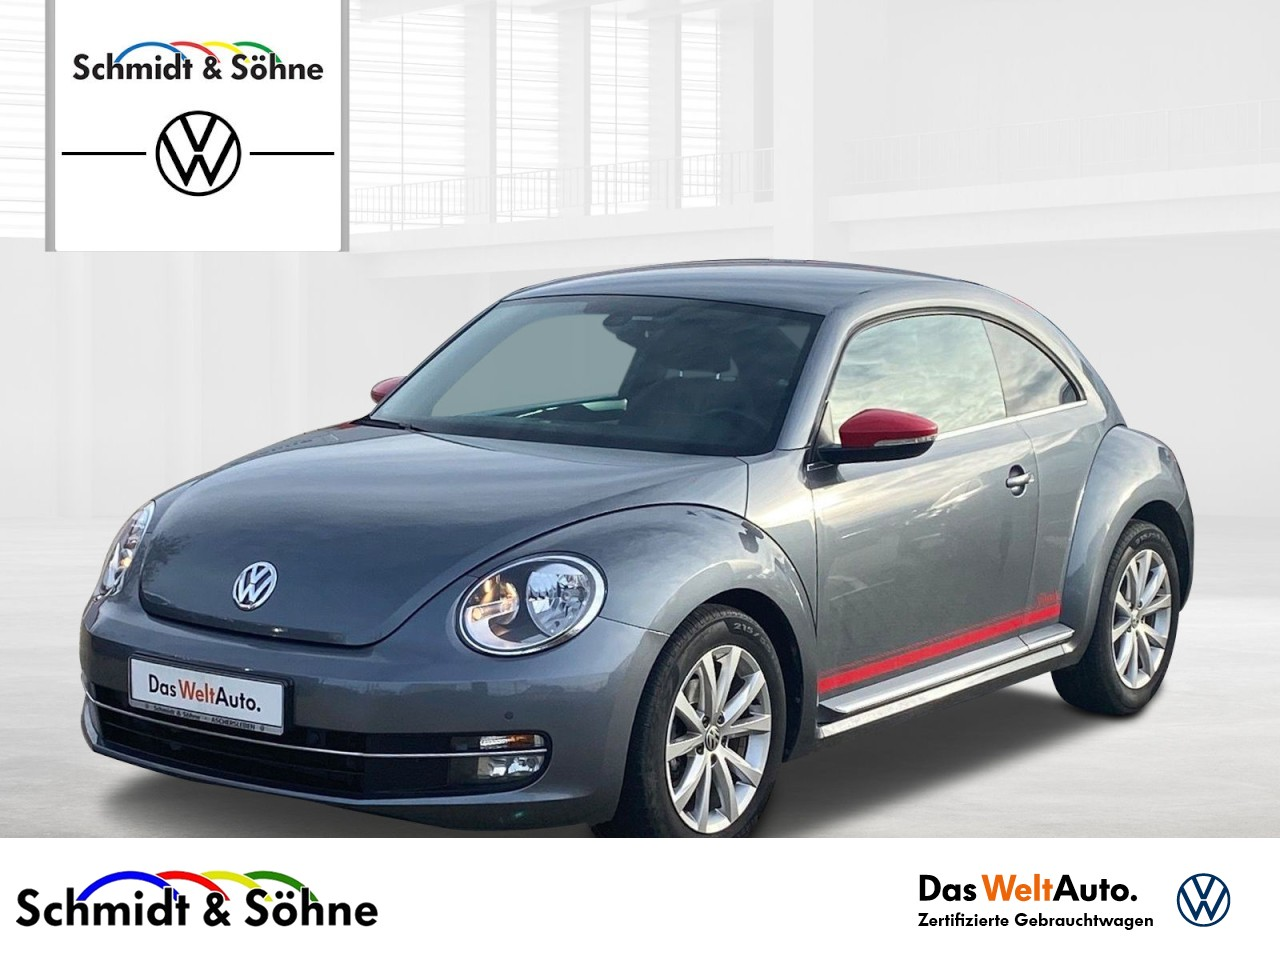 Volkswagen Beetle Club 1.2 TSI 6-Gang NAVI, GRA, SHZ, EPH,, Jahr 2015, Benzin